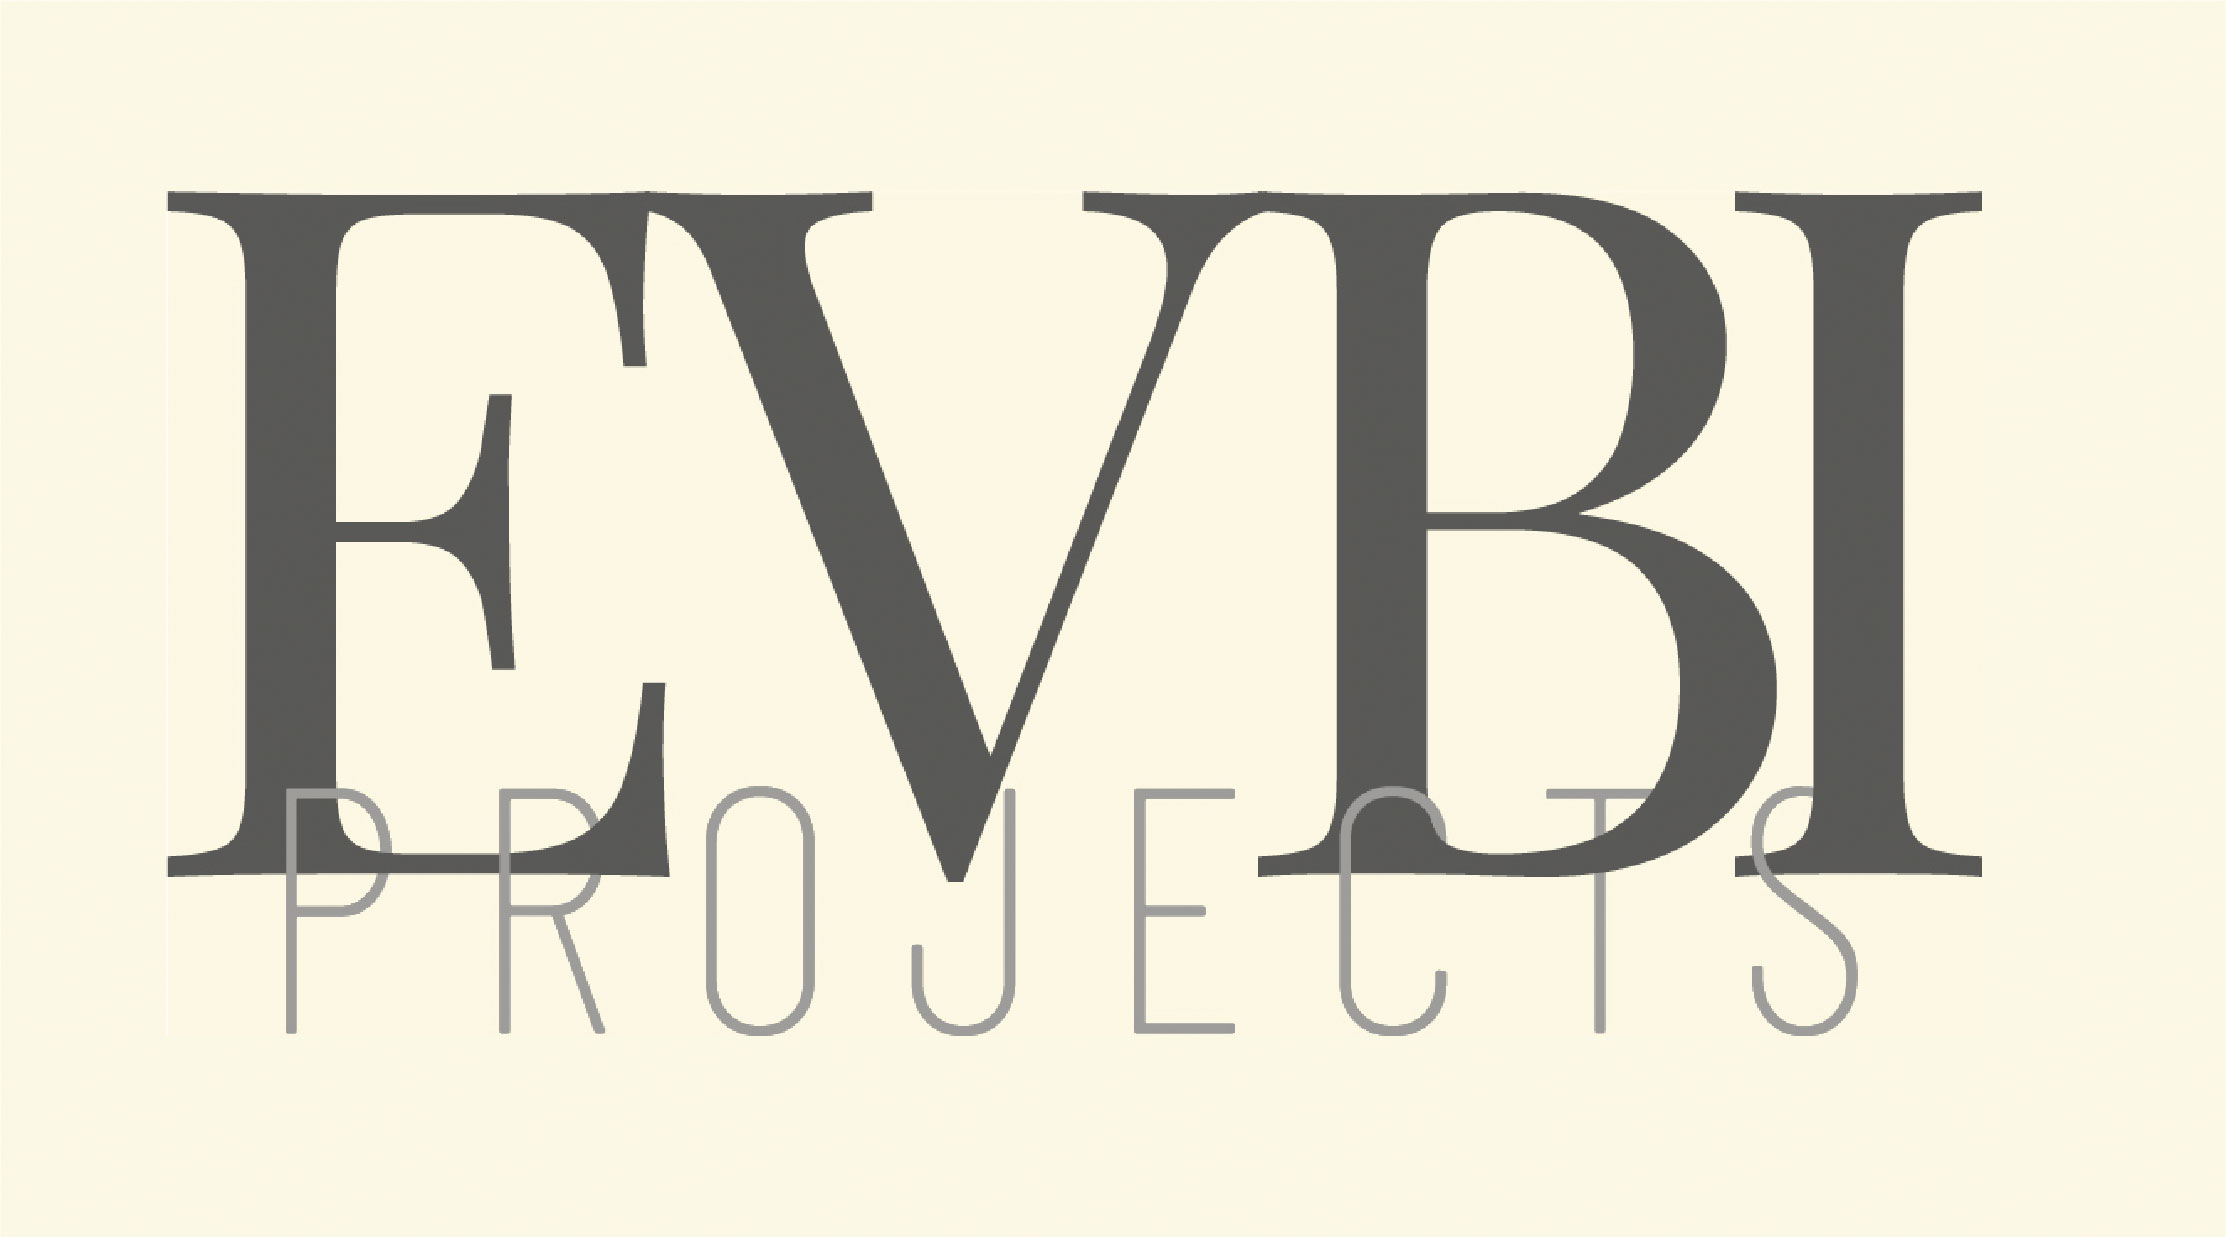 Evbi Projects - Custom Blog Branding